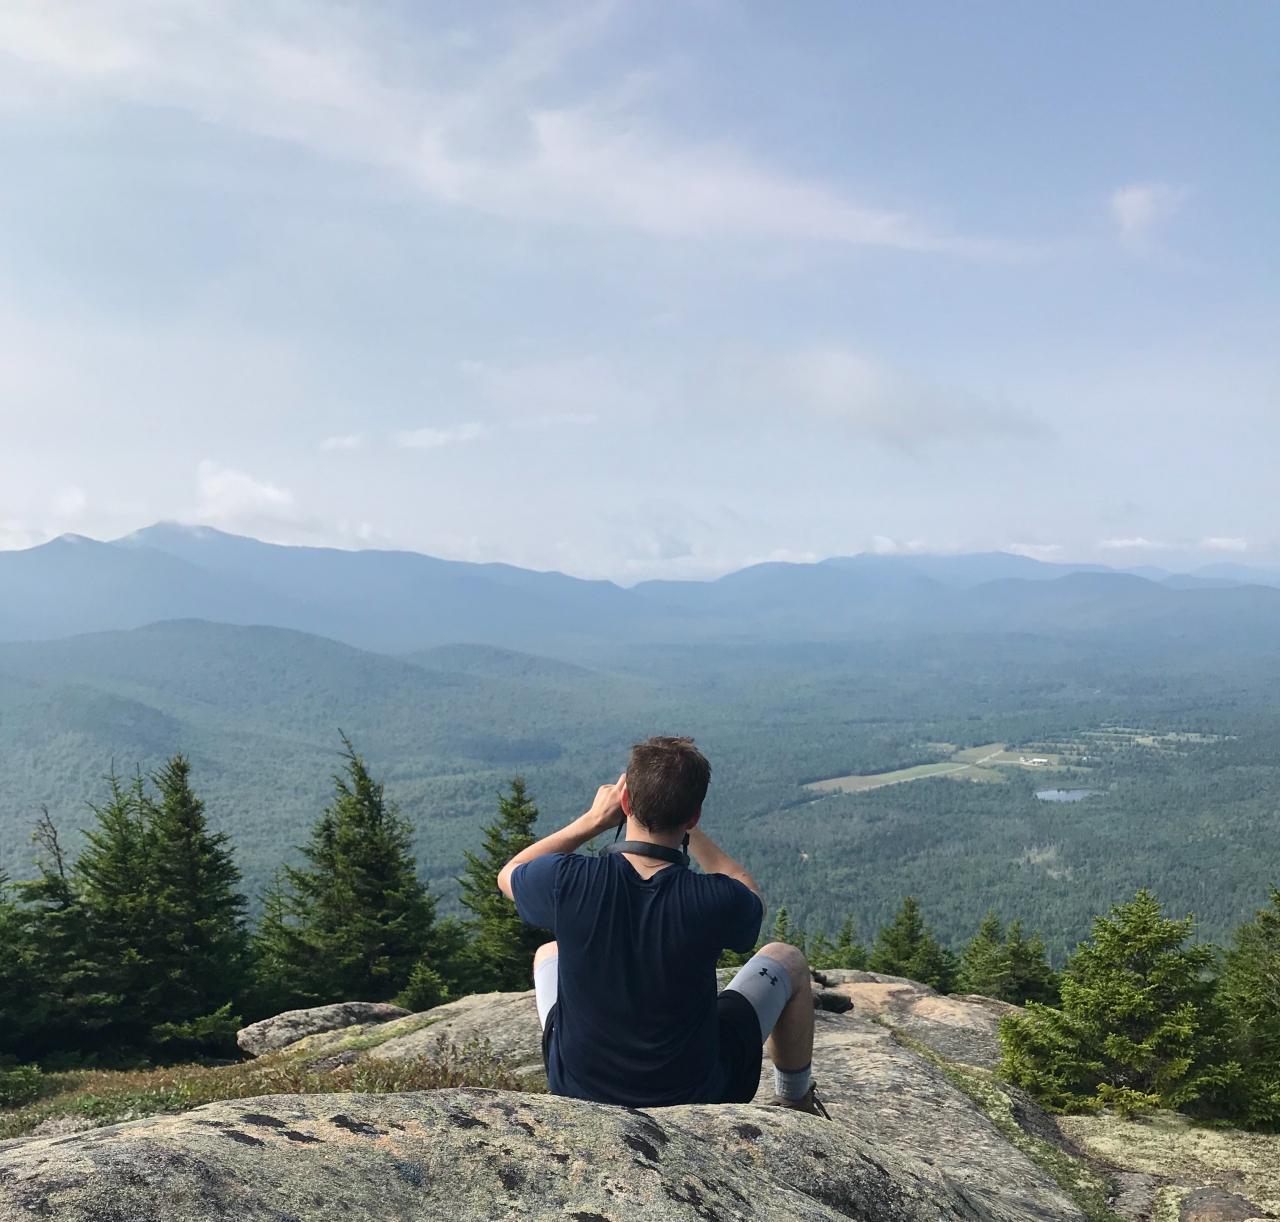 Catamount Mountain: An Isolated Gem of theAdirondacks